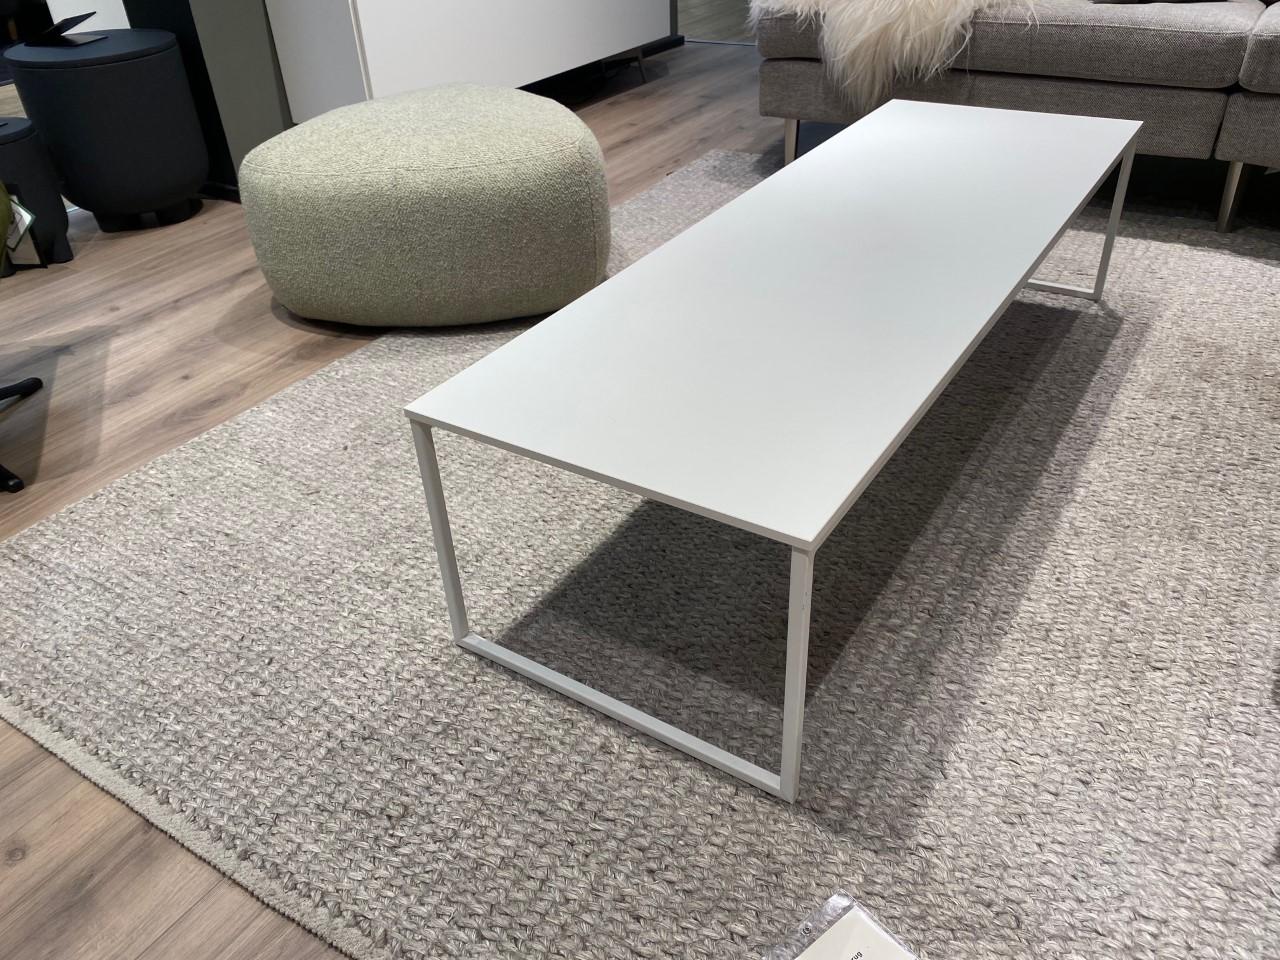 Lugo coffee table